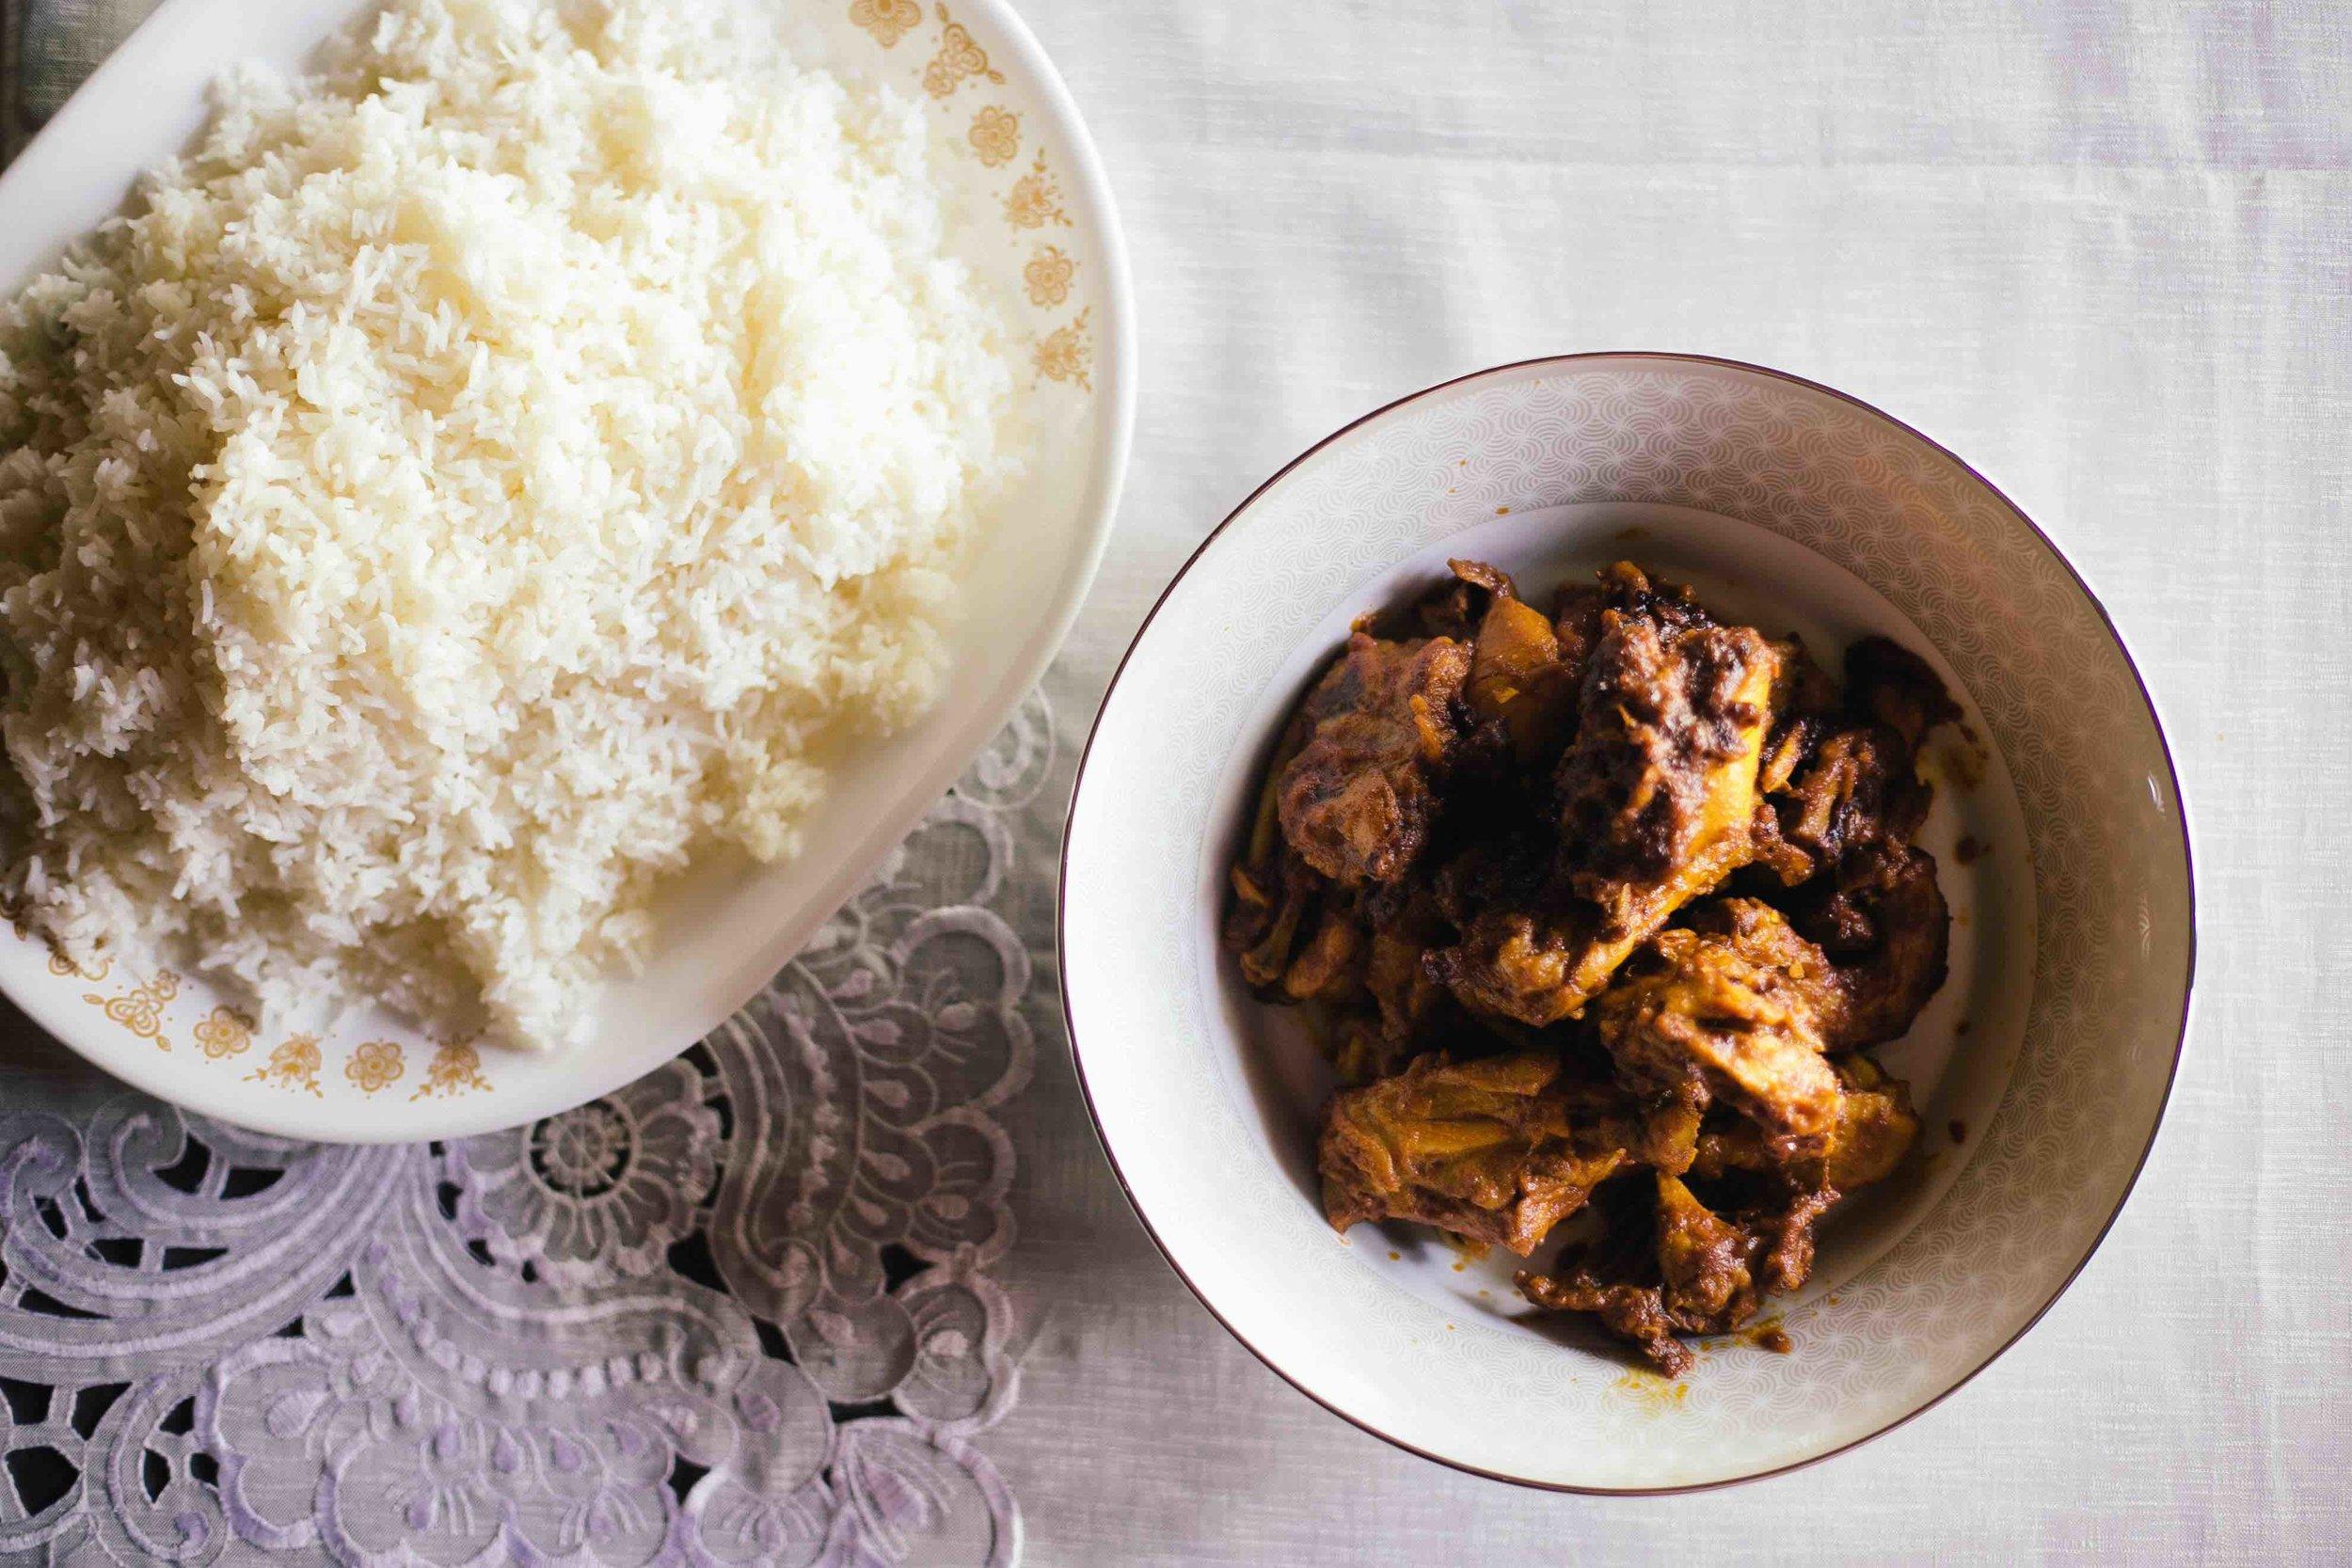 Authentic Kerala neichoru or ghee rice